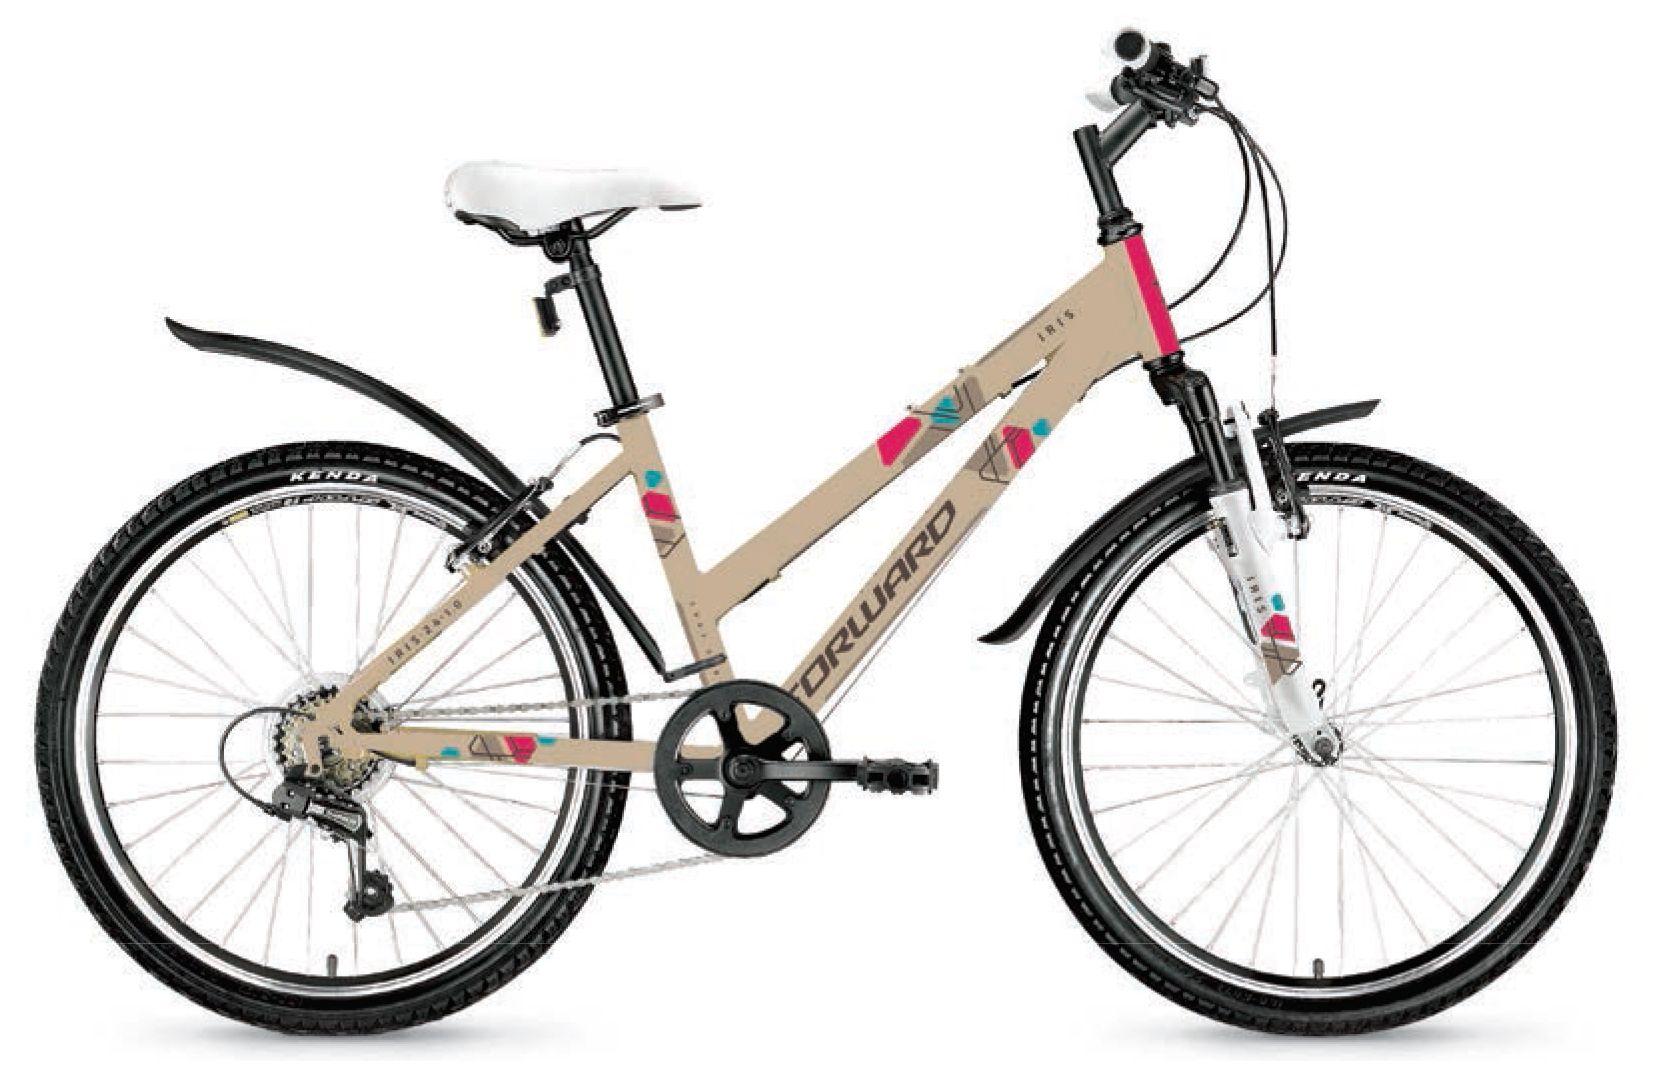 Велосипед Forward Iris 24 1.0 2017 велосипед forward iris 26 1 0 2017